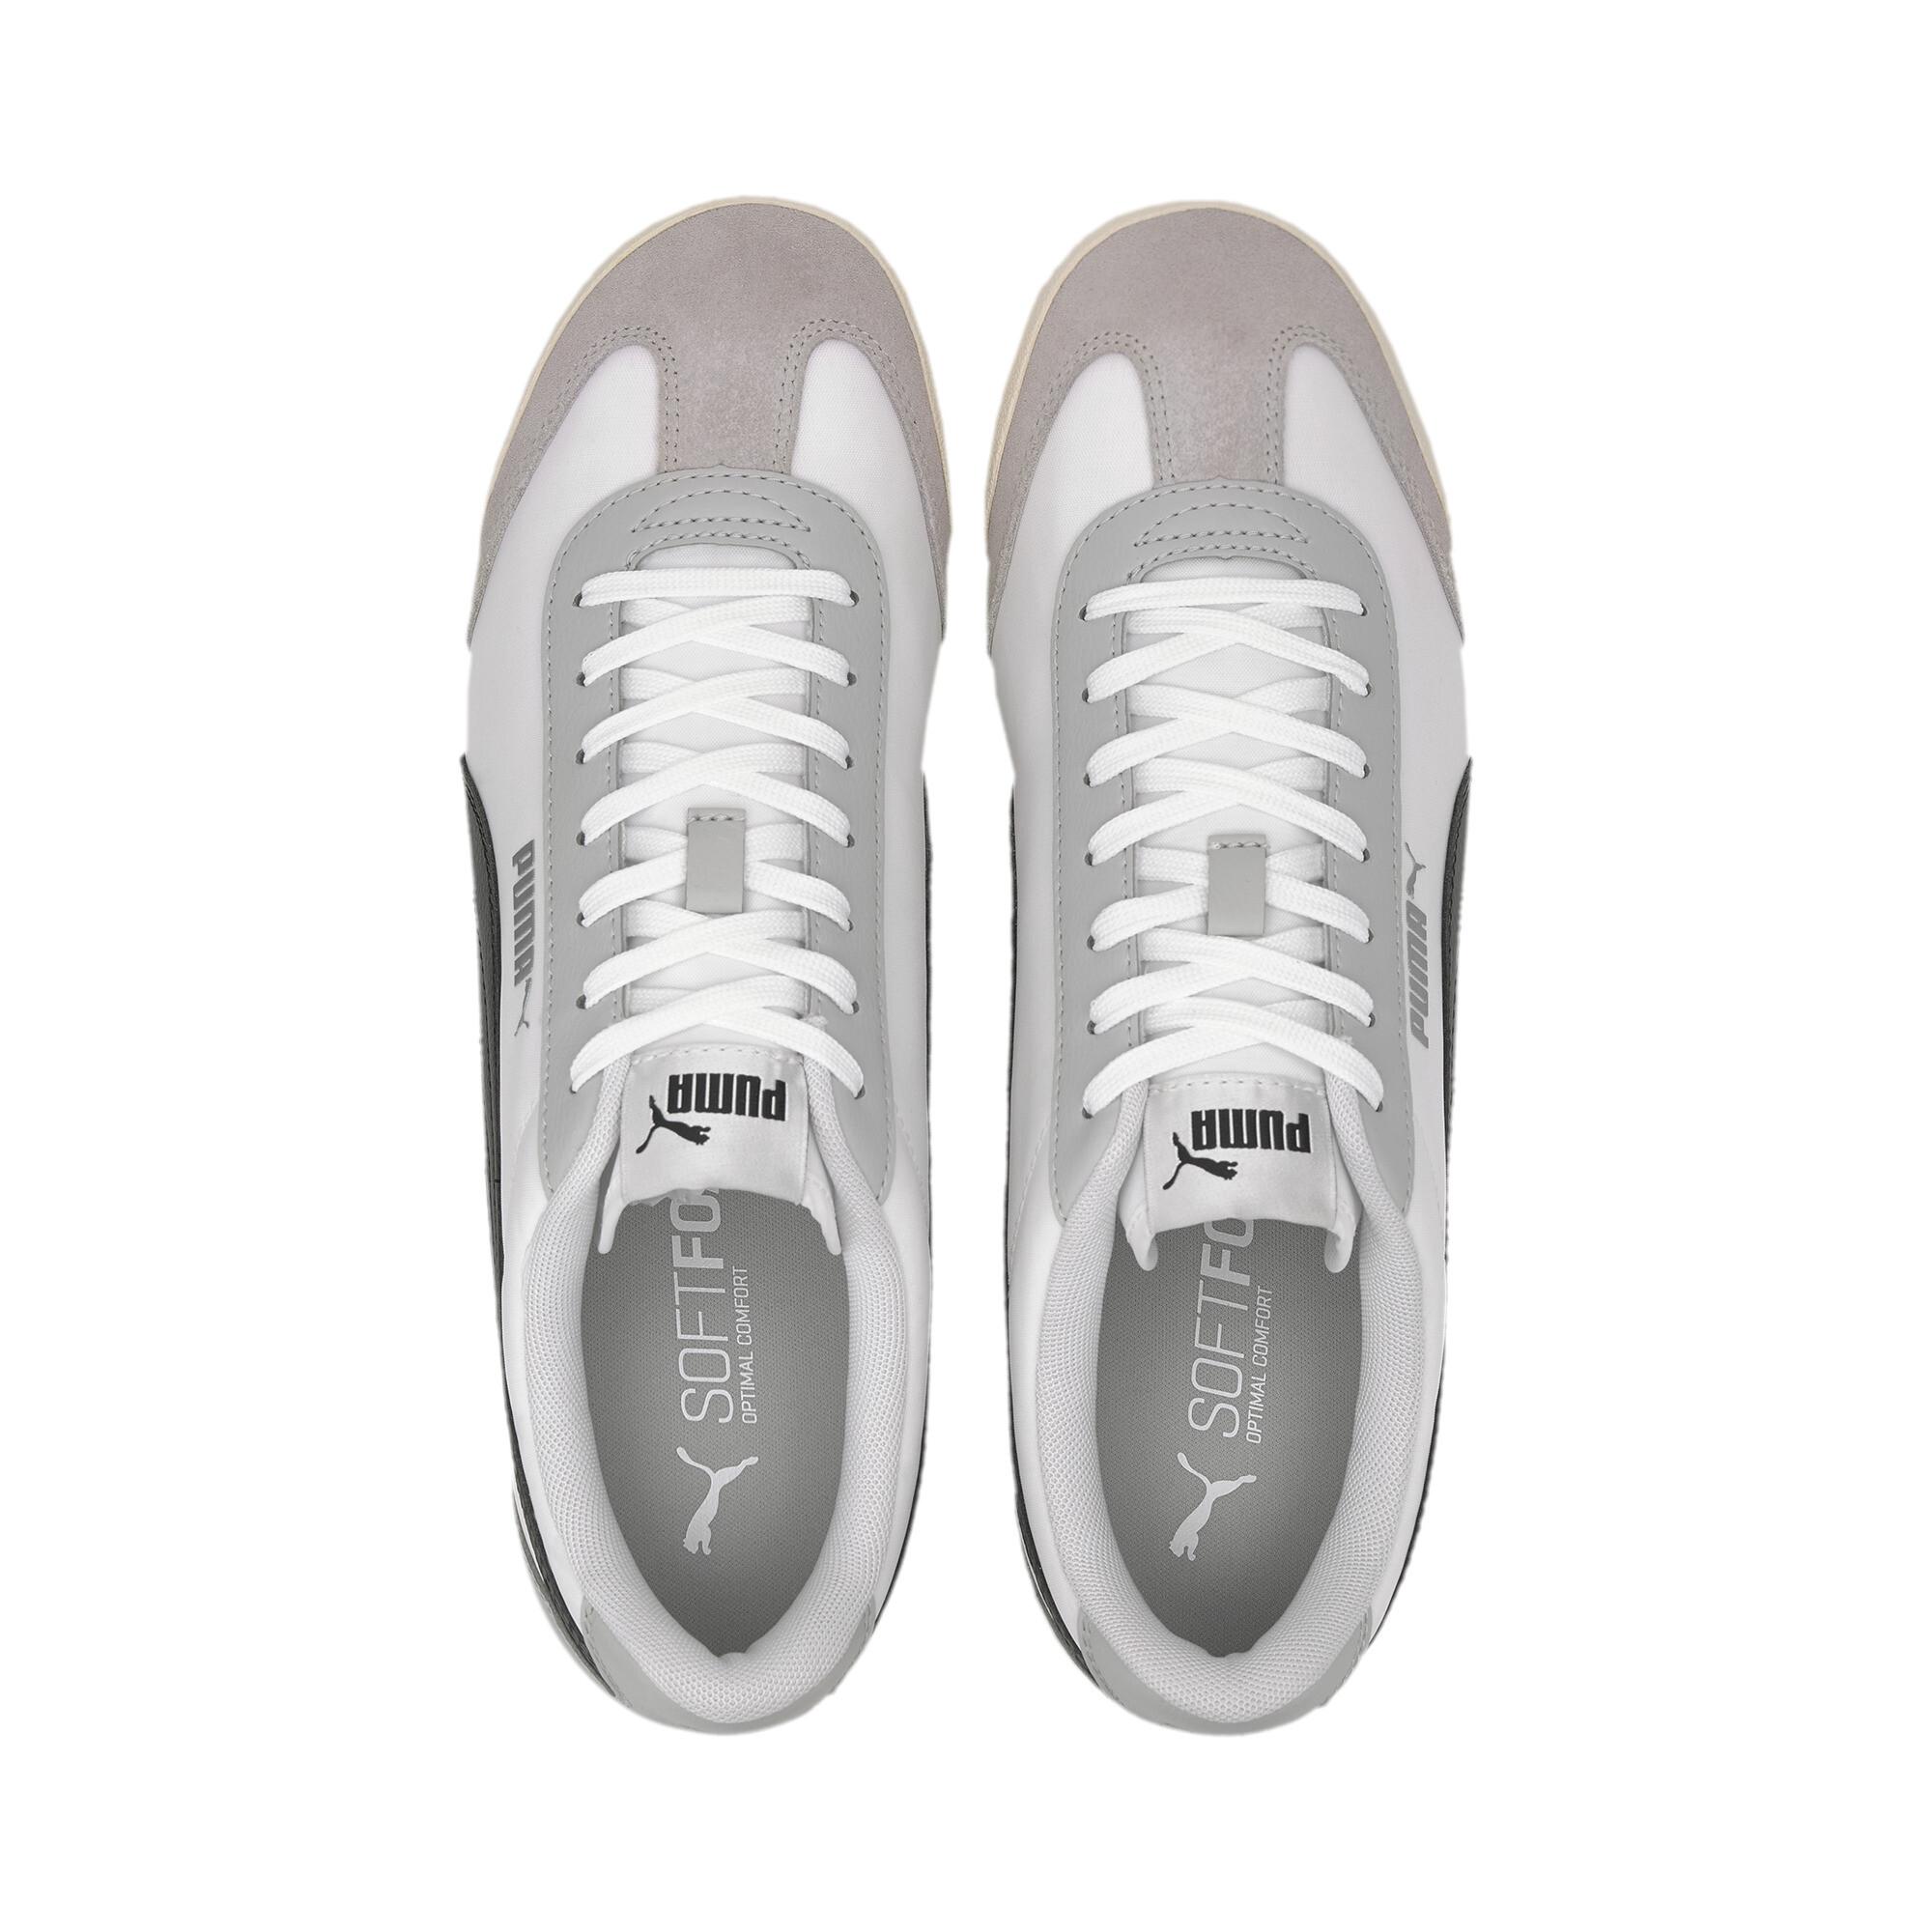 PUMA-Men-039-s-Turino-NL-Sneakers thumbnail 8